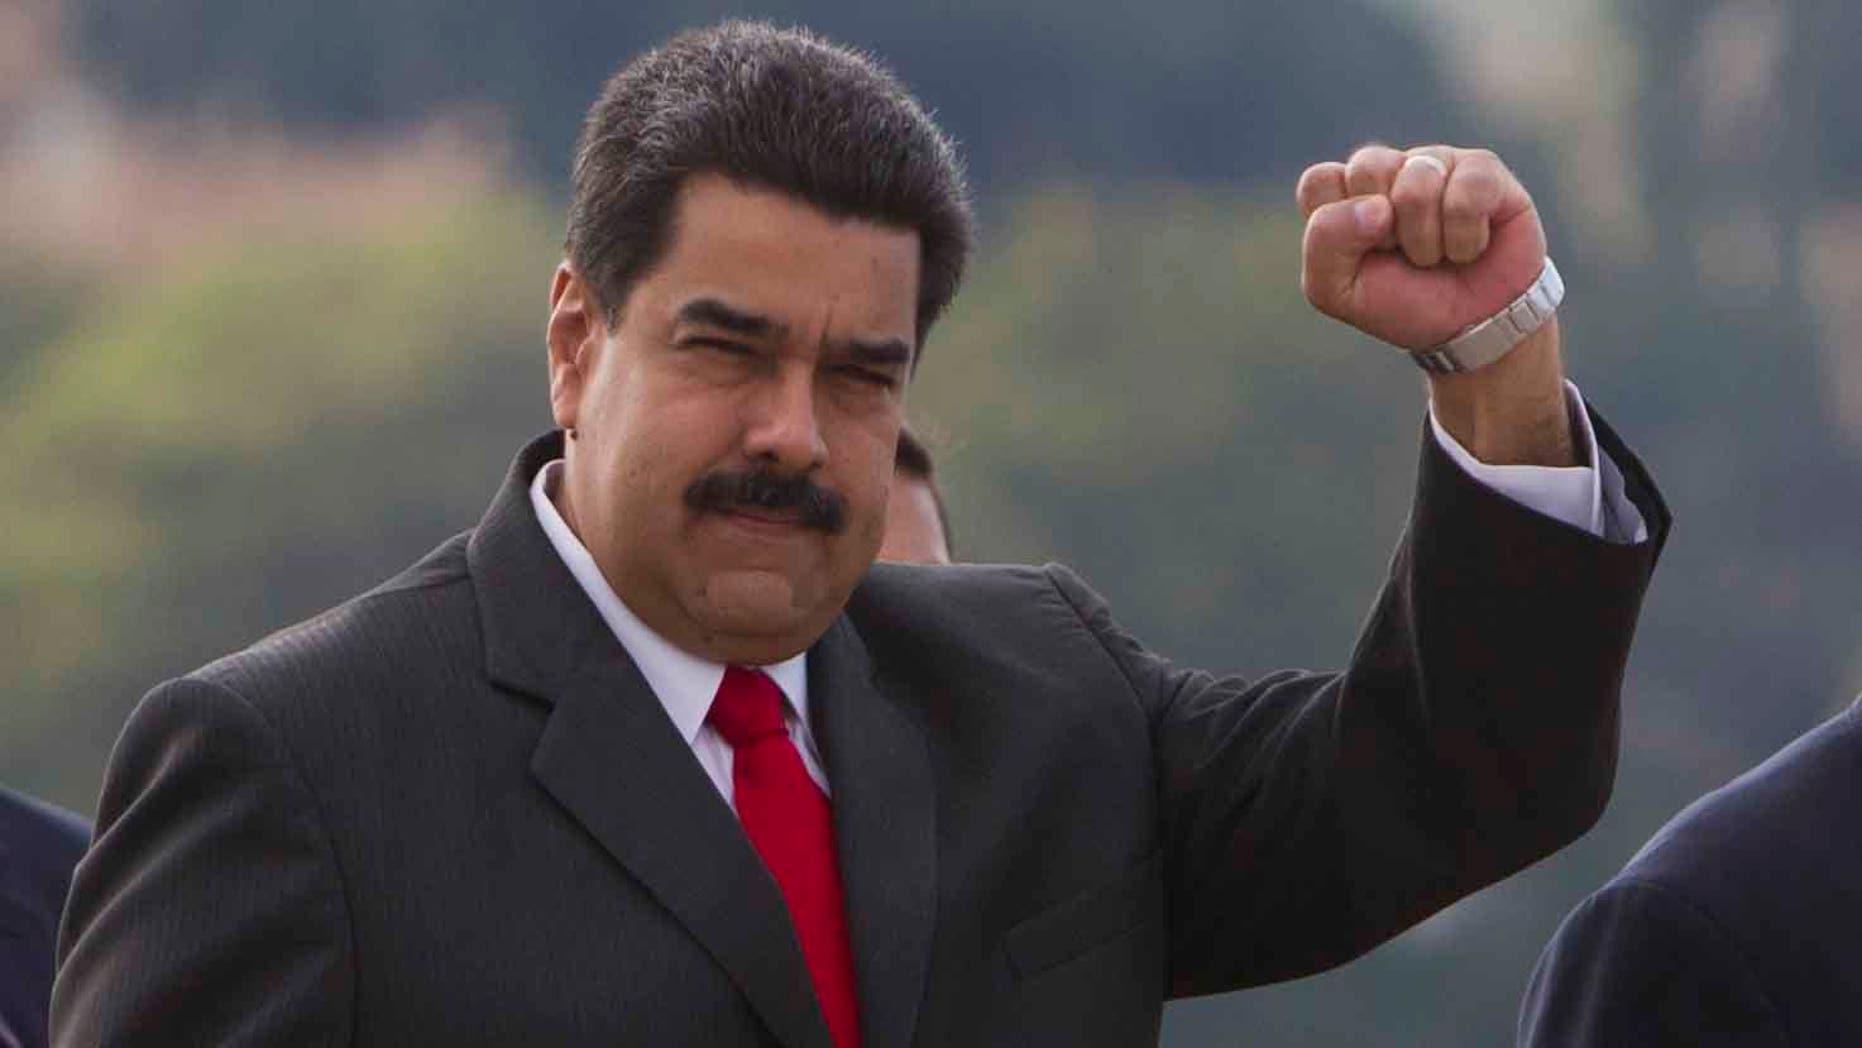 Venezuela's President Nicolas Maduro on March 18, 2016 in Havana, Cuba.